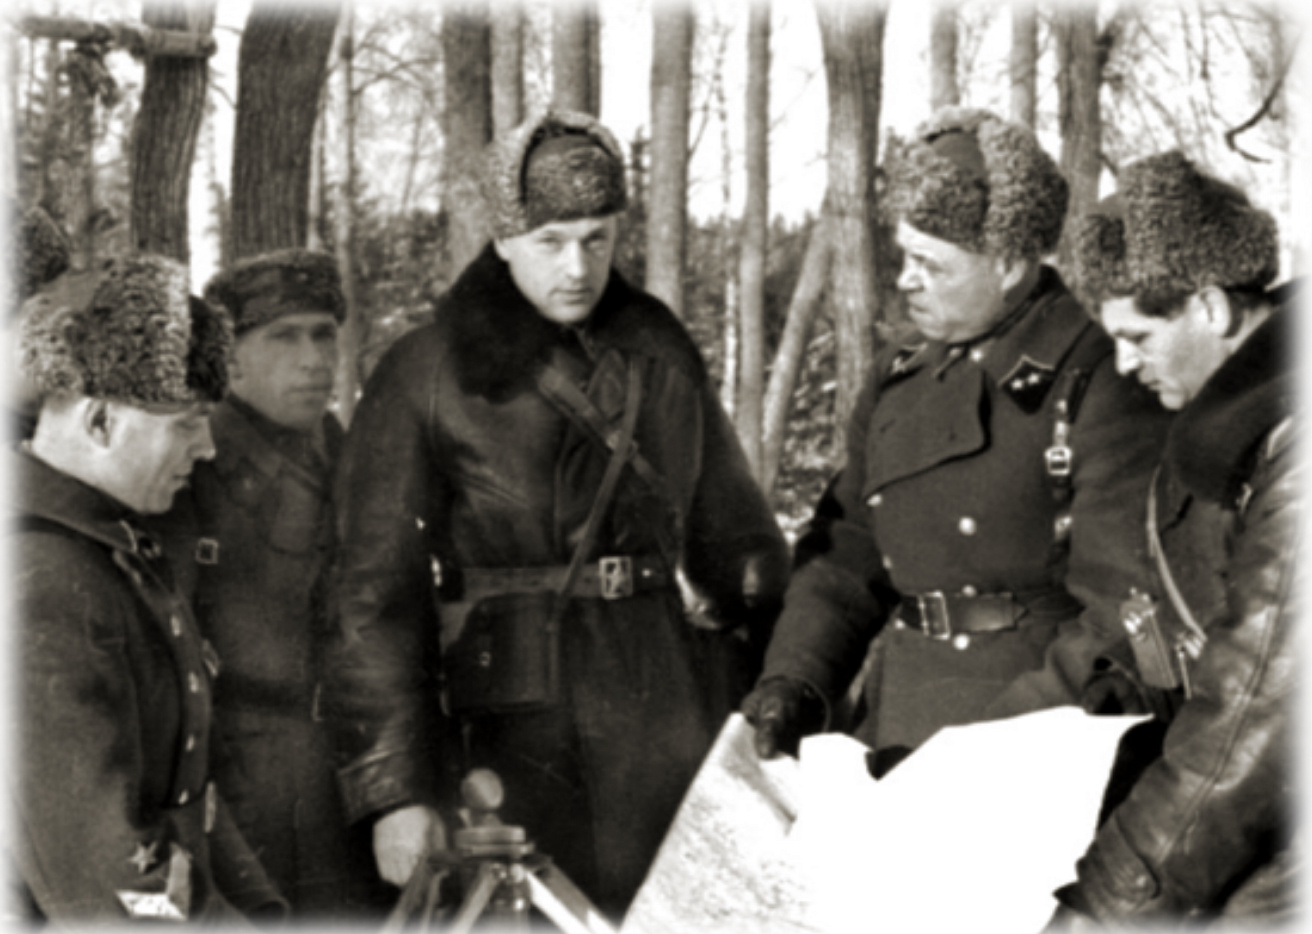 rokossovskii-bitva-za-moskvu6